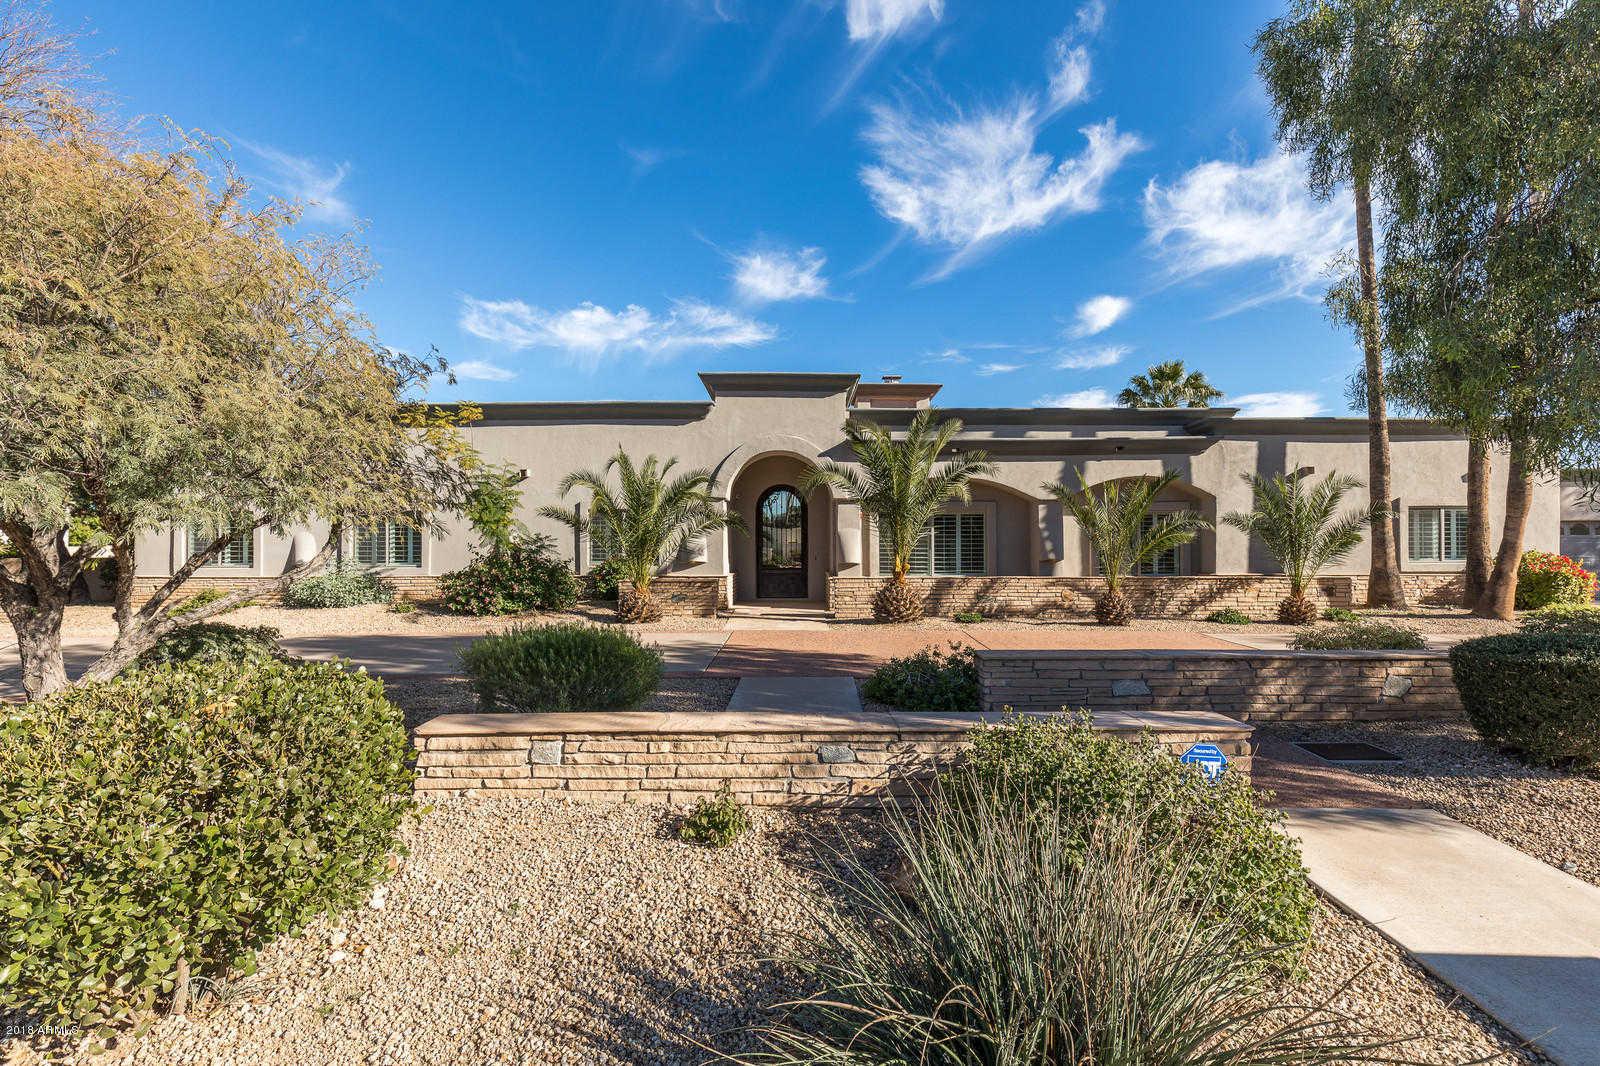 $1,360,000 - 6Br/5Ba - Home for Sale in Tatum Garden Estates 3 Lot 1-33, Paradise Valley